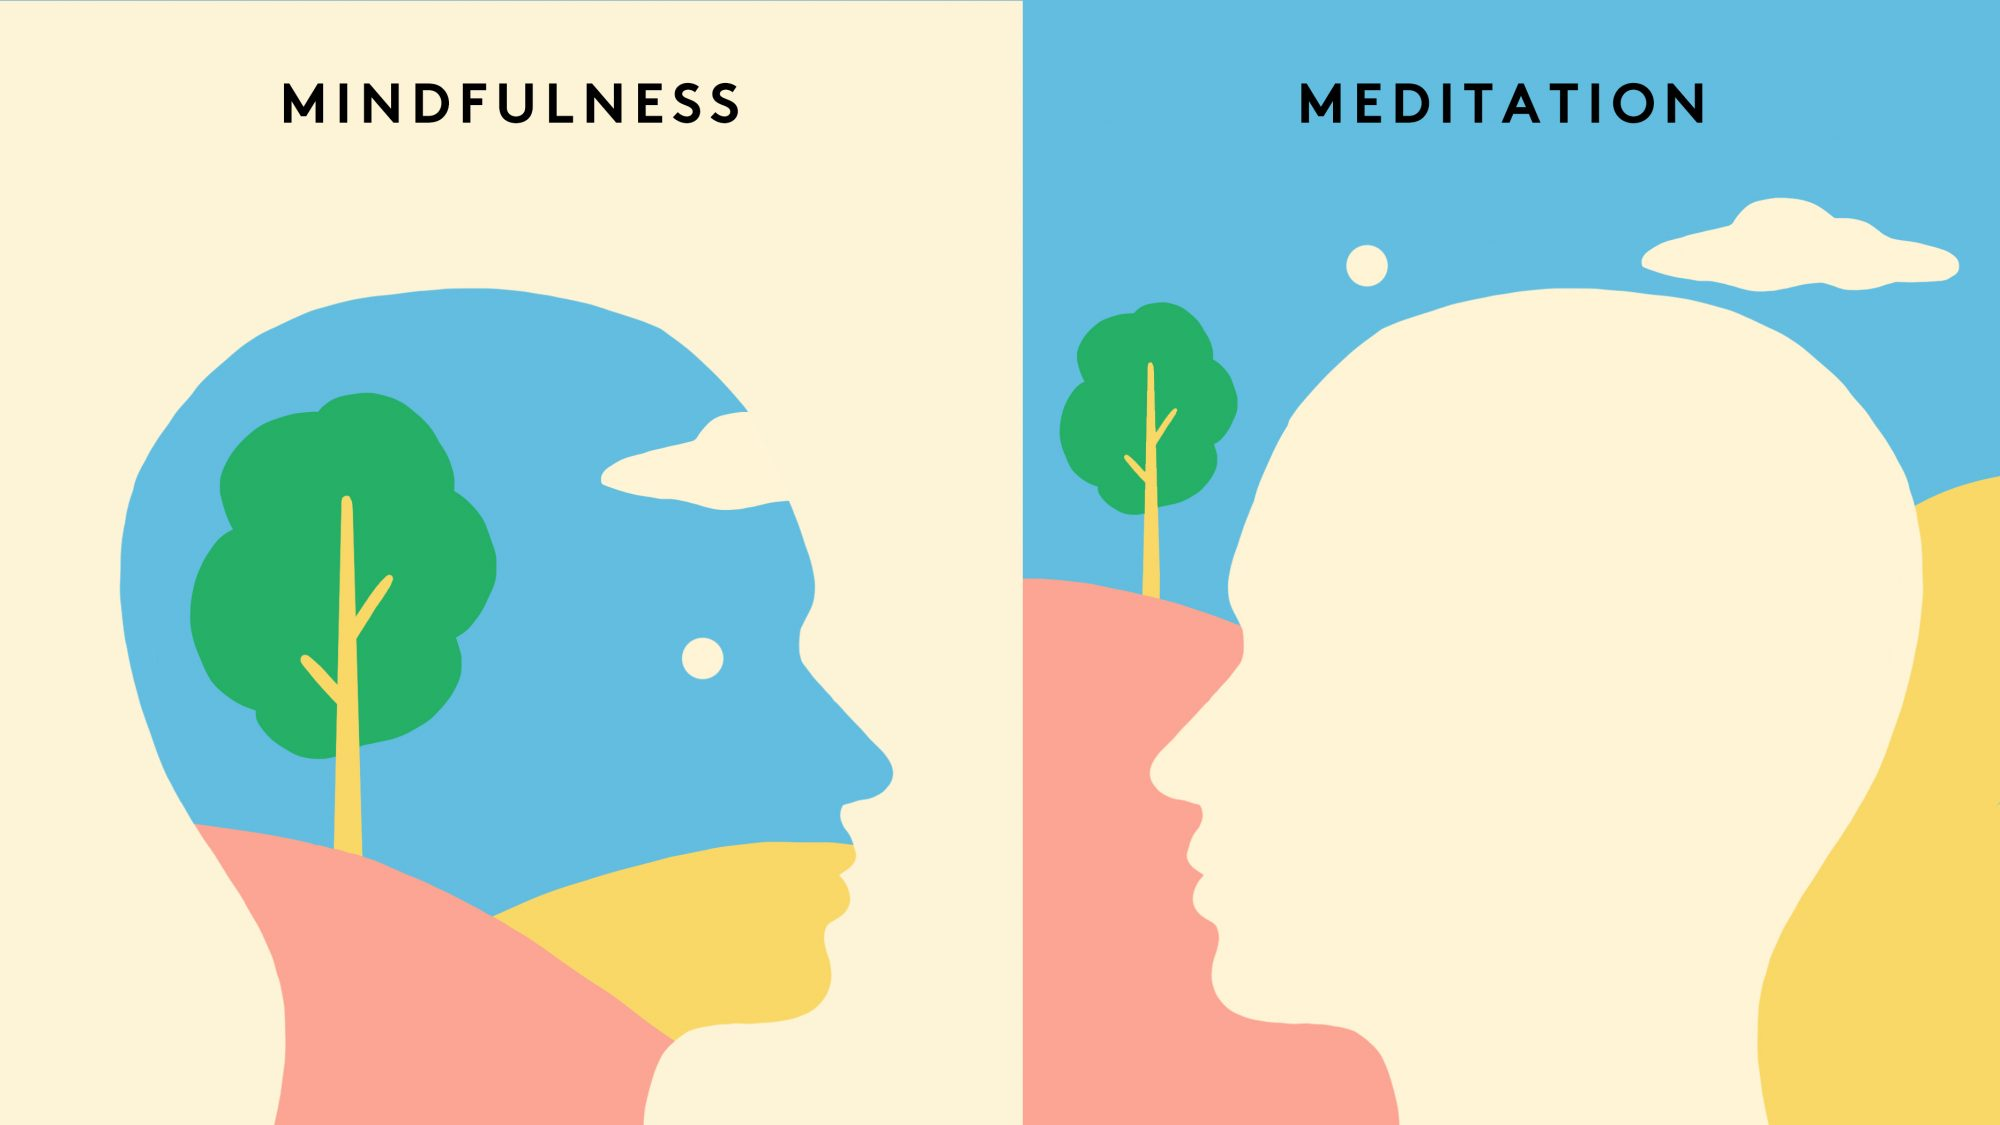 Mindfulness versus Meditation Image